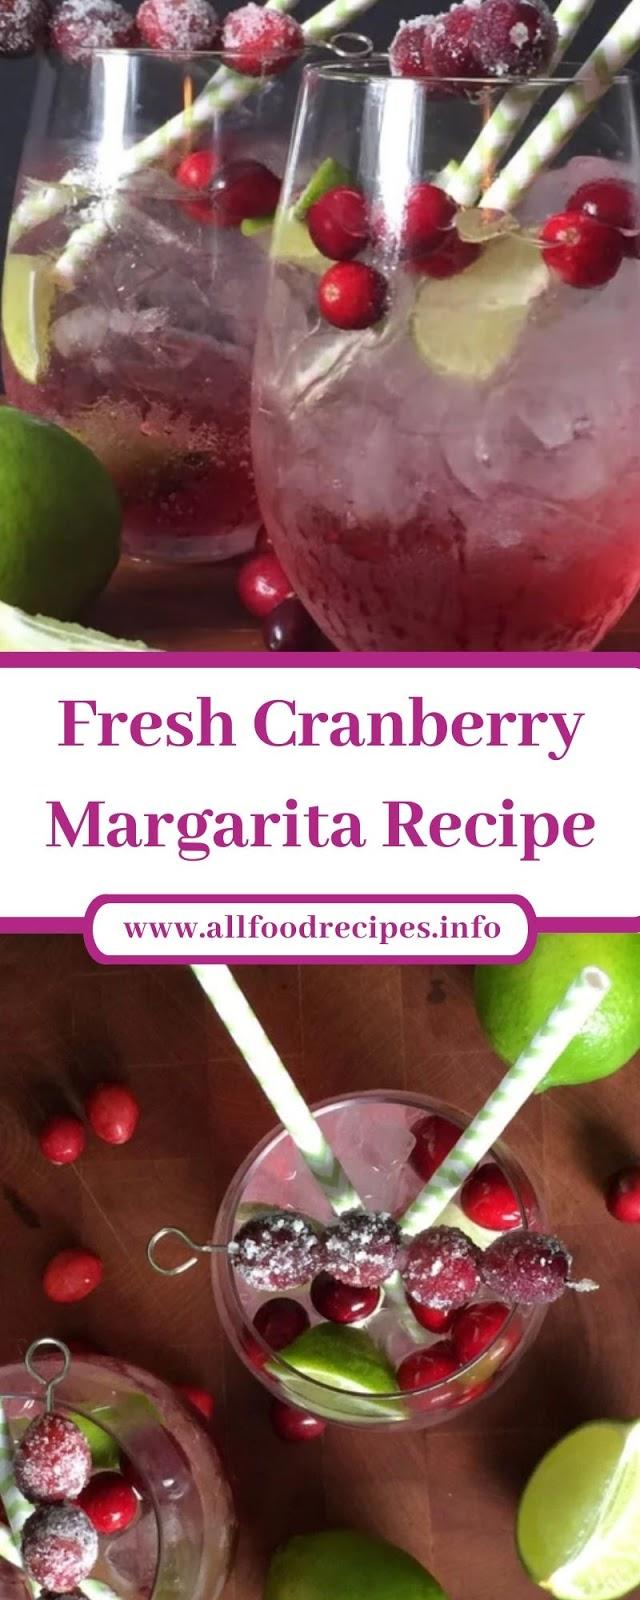 Fresh Cranberry Margarita Recipe